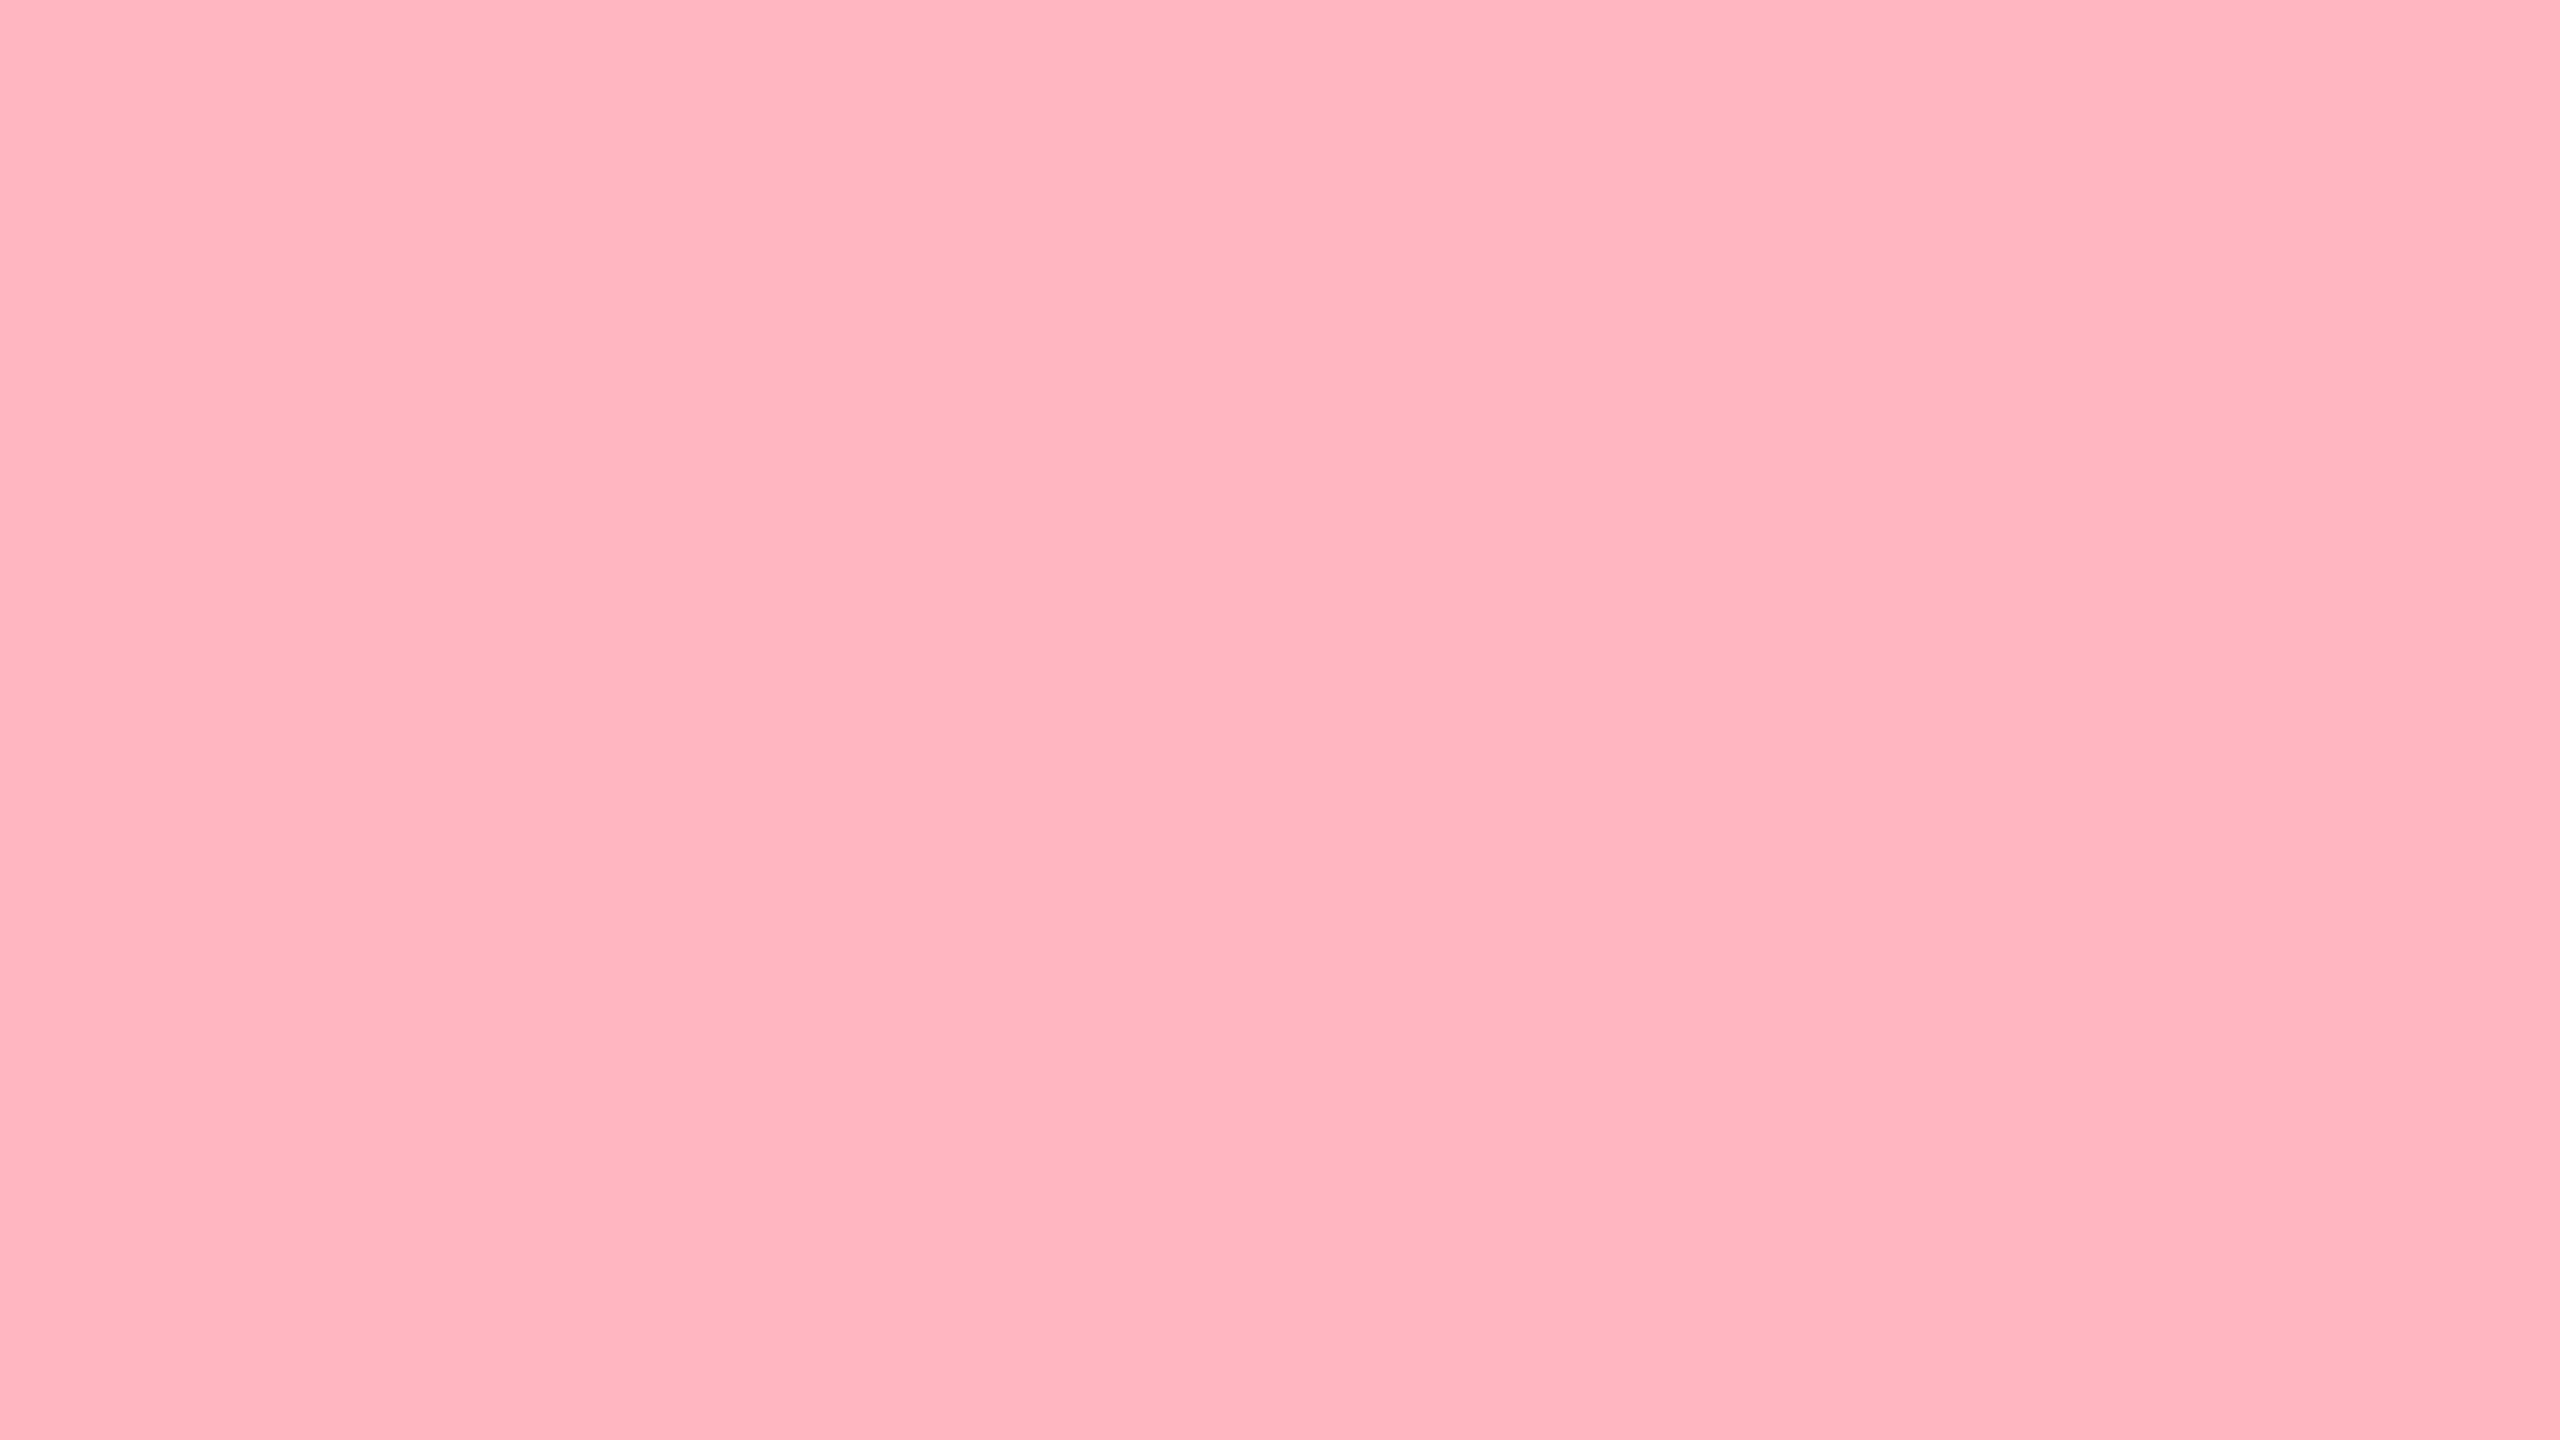 Light-Pink-Solid-Color-Wallpaper